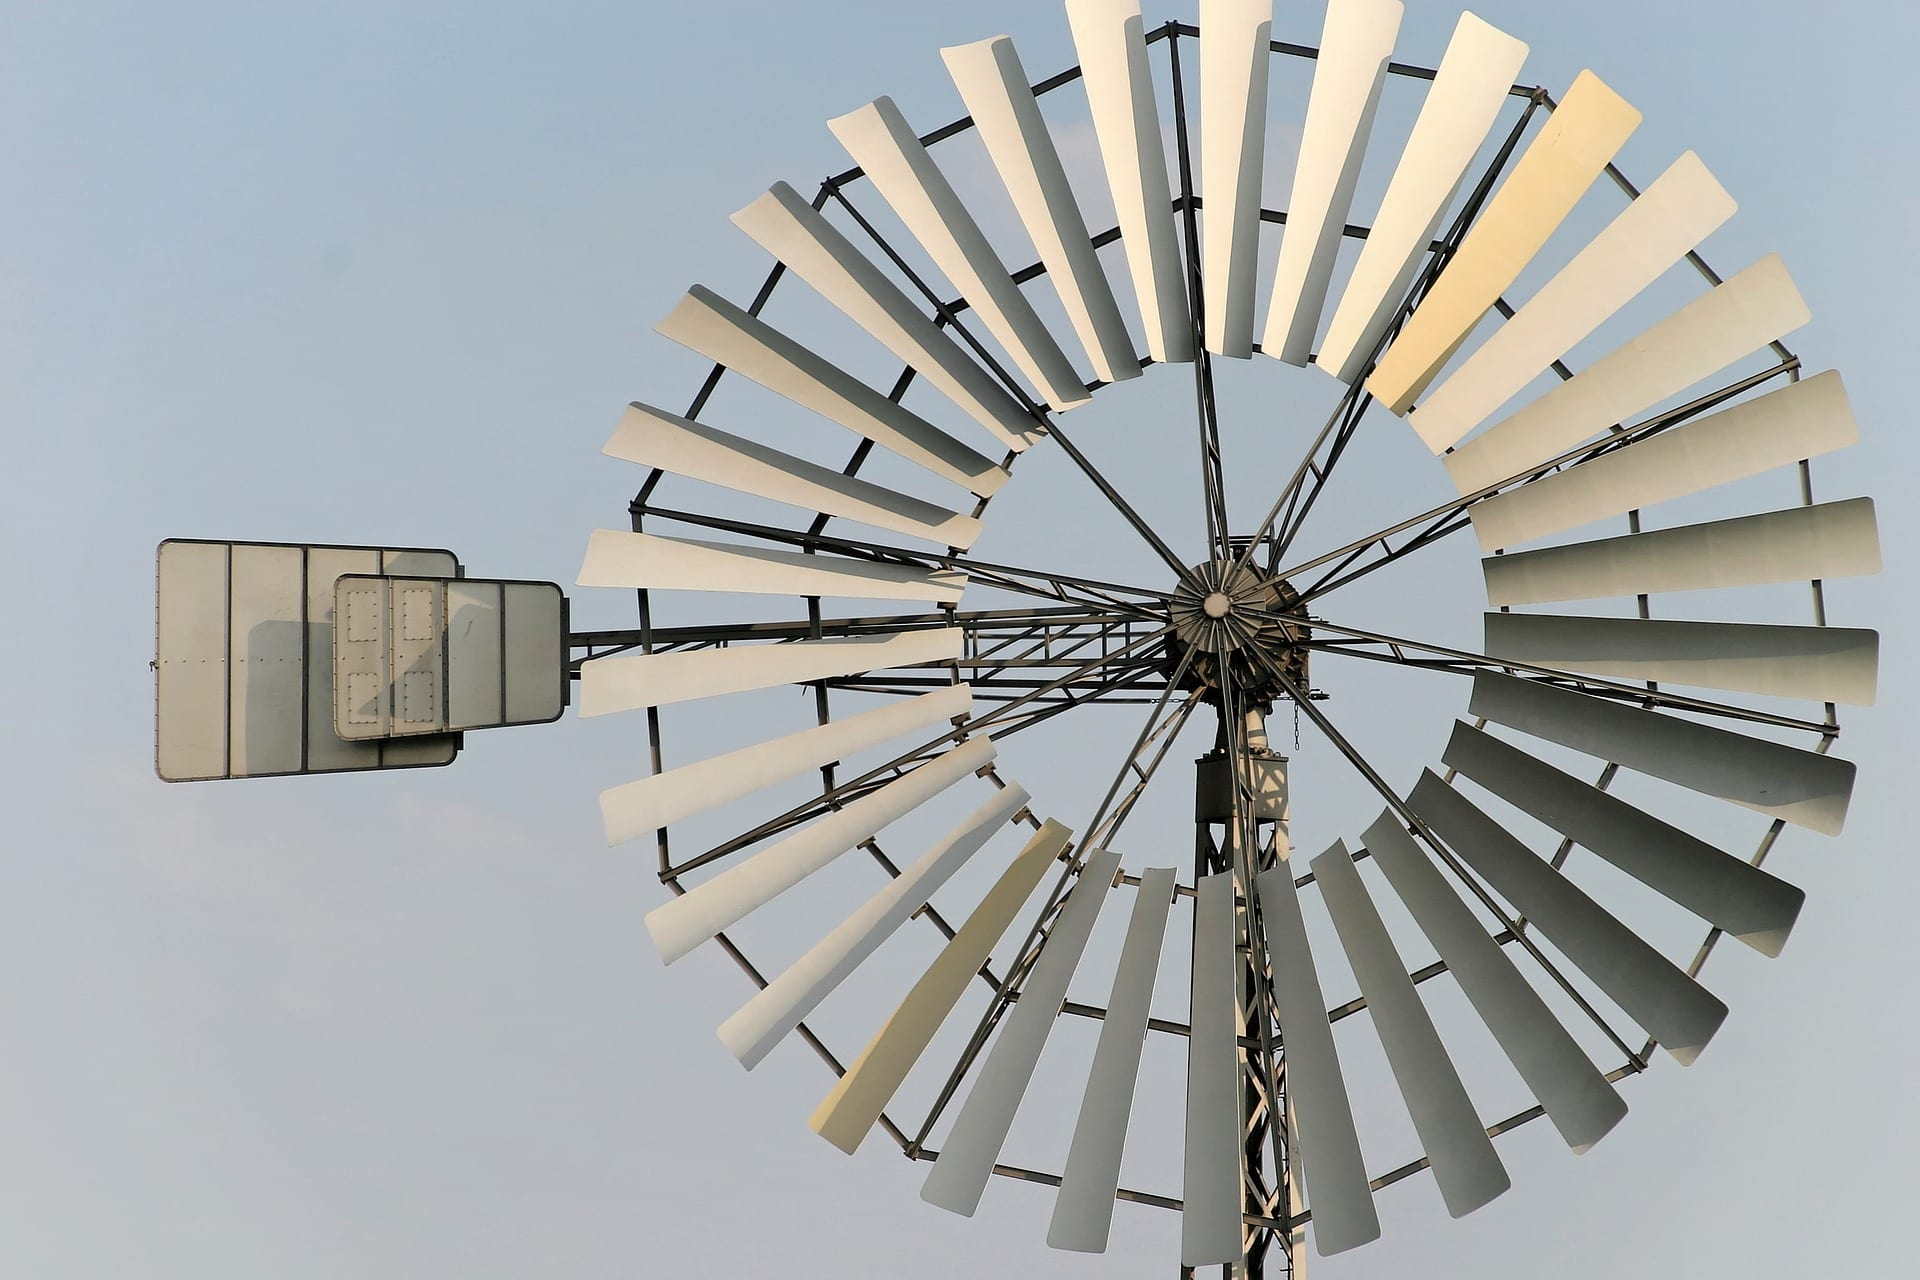 Voda, nebo vítr? Hodí se malé elektrárny do domácnosti?